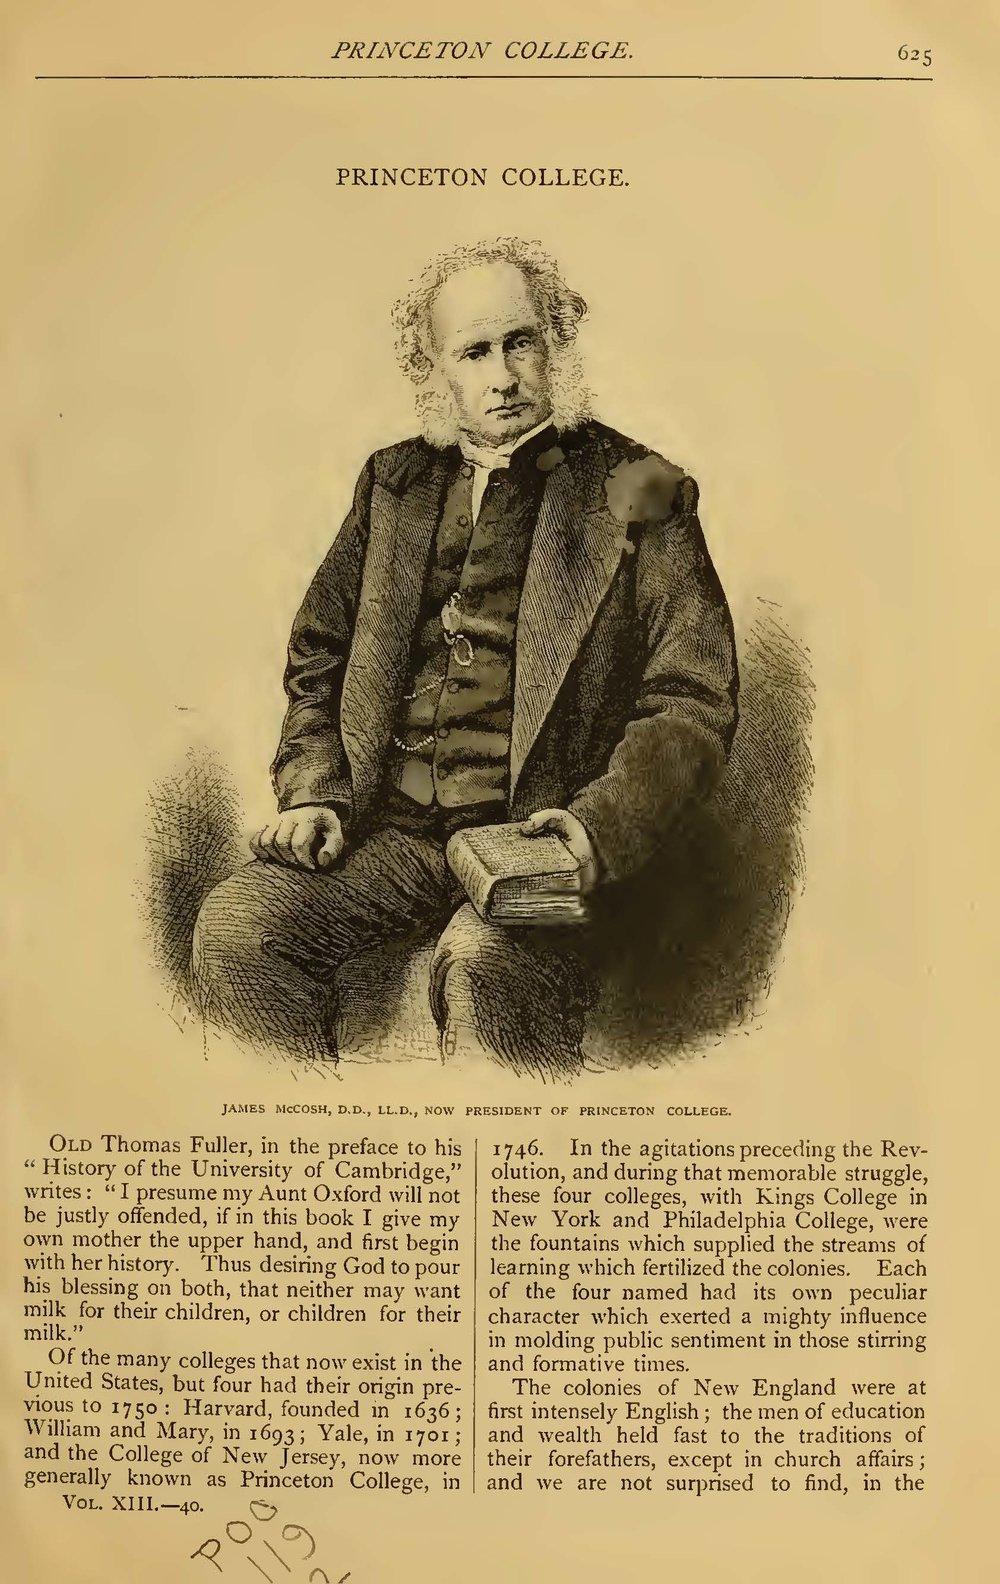 Alexander, Samuel Davies, Princeton College Title Page.jpg